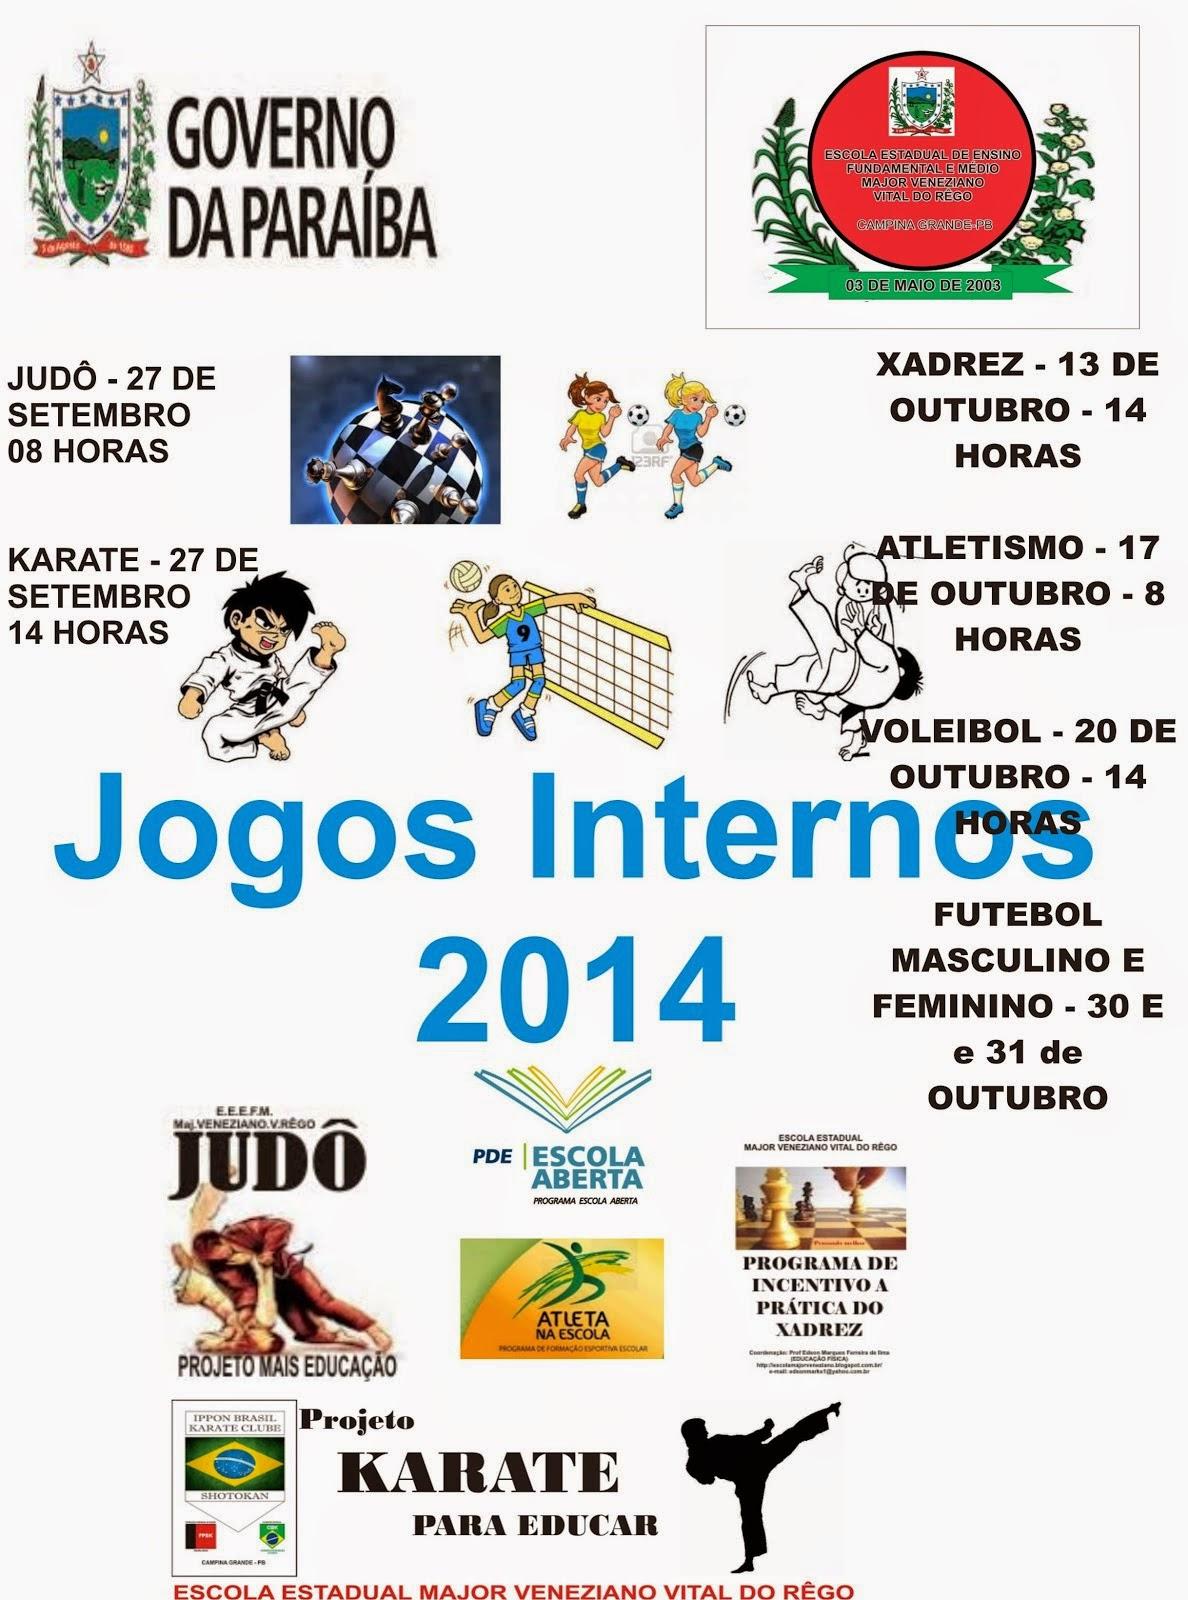 JOGOS INTERNOS 2014